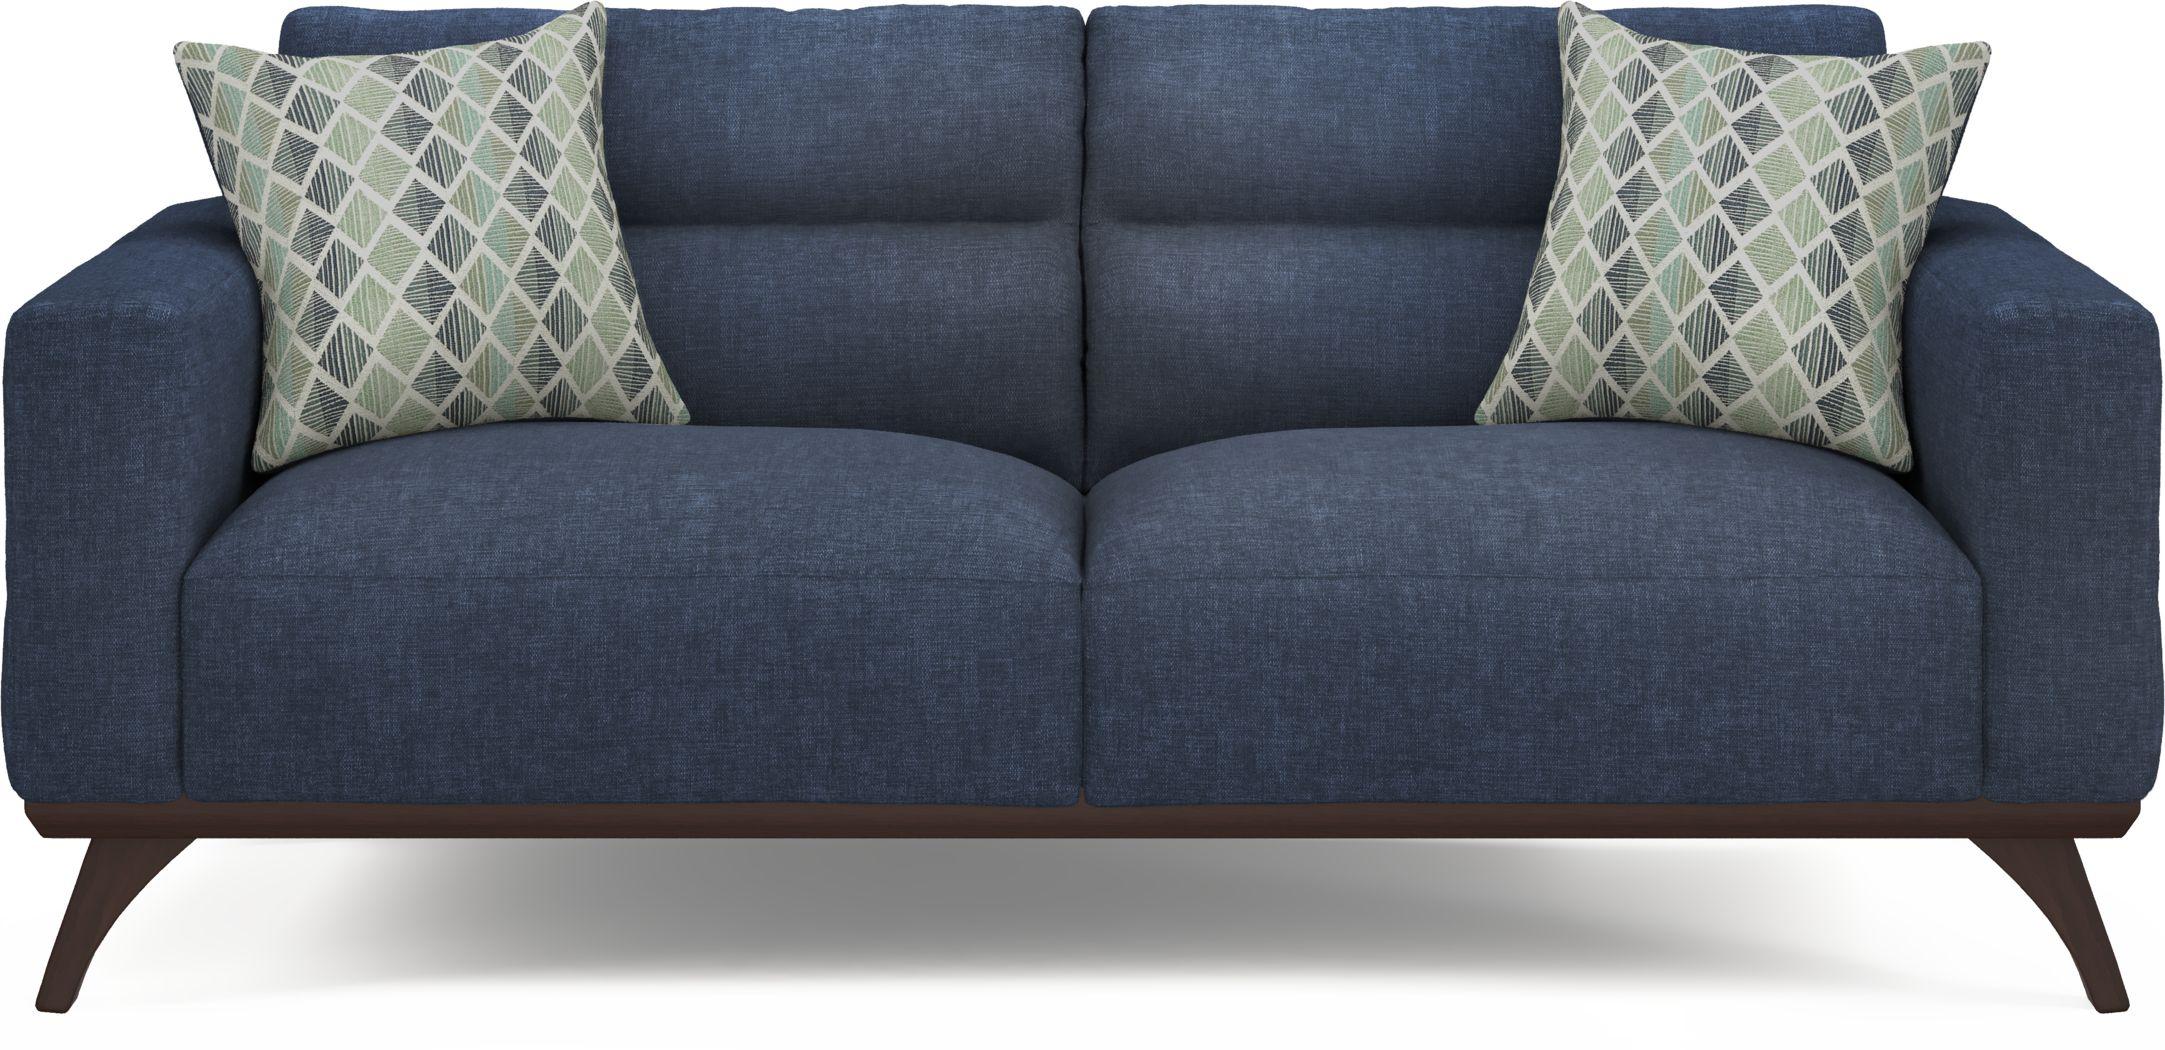 Broadview Park Navy Sofa